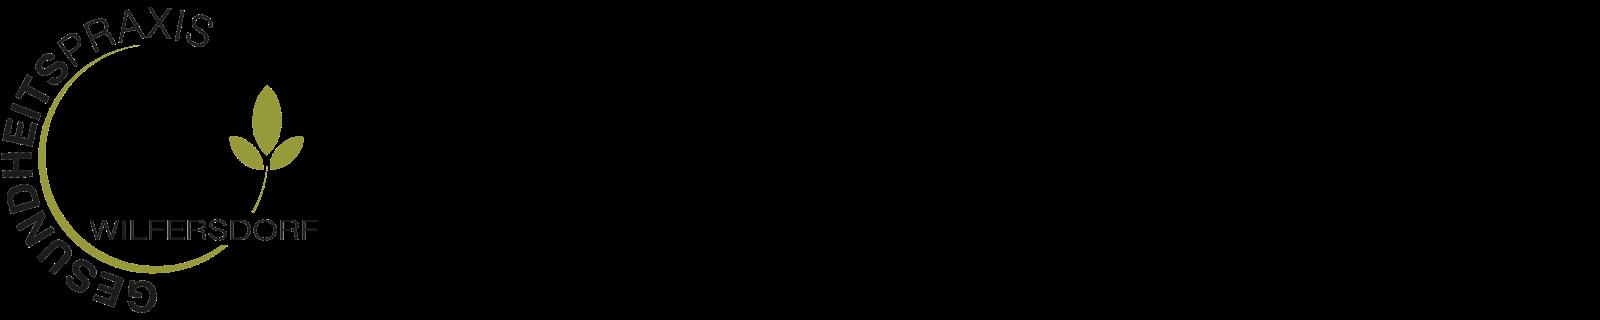 Gesundheitspraxis Wilfersdorf